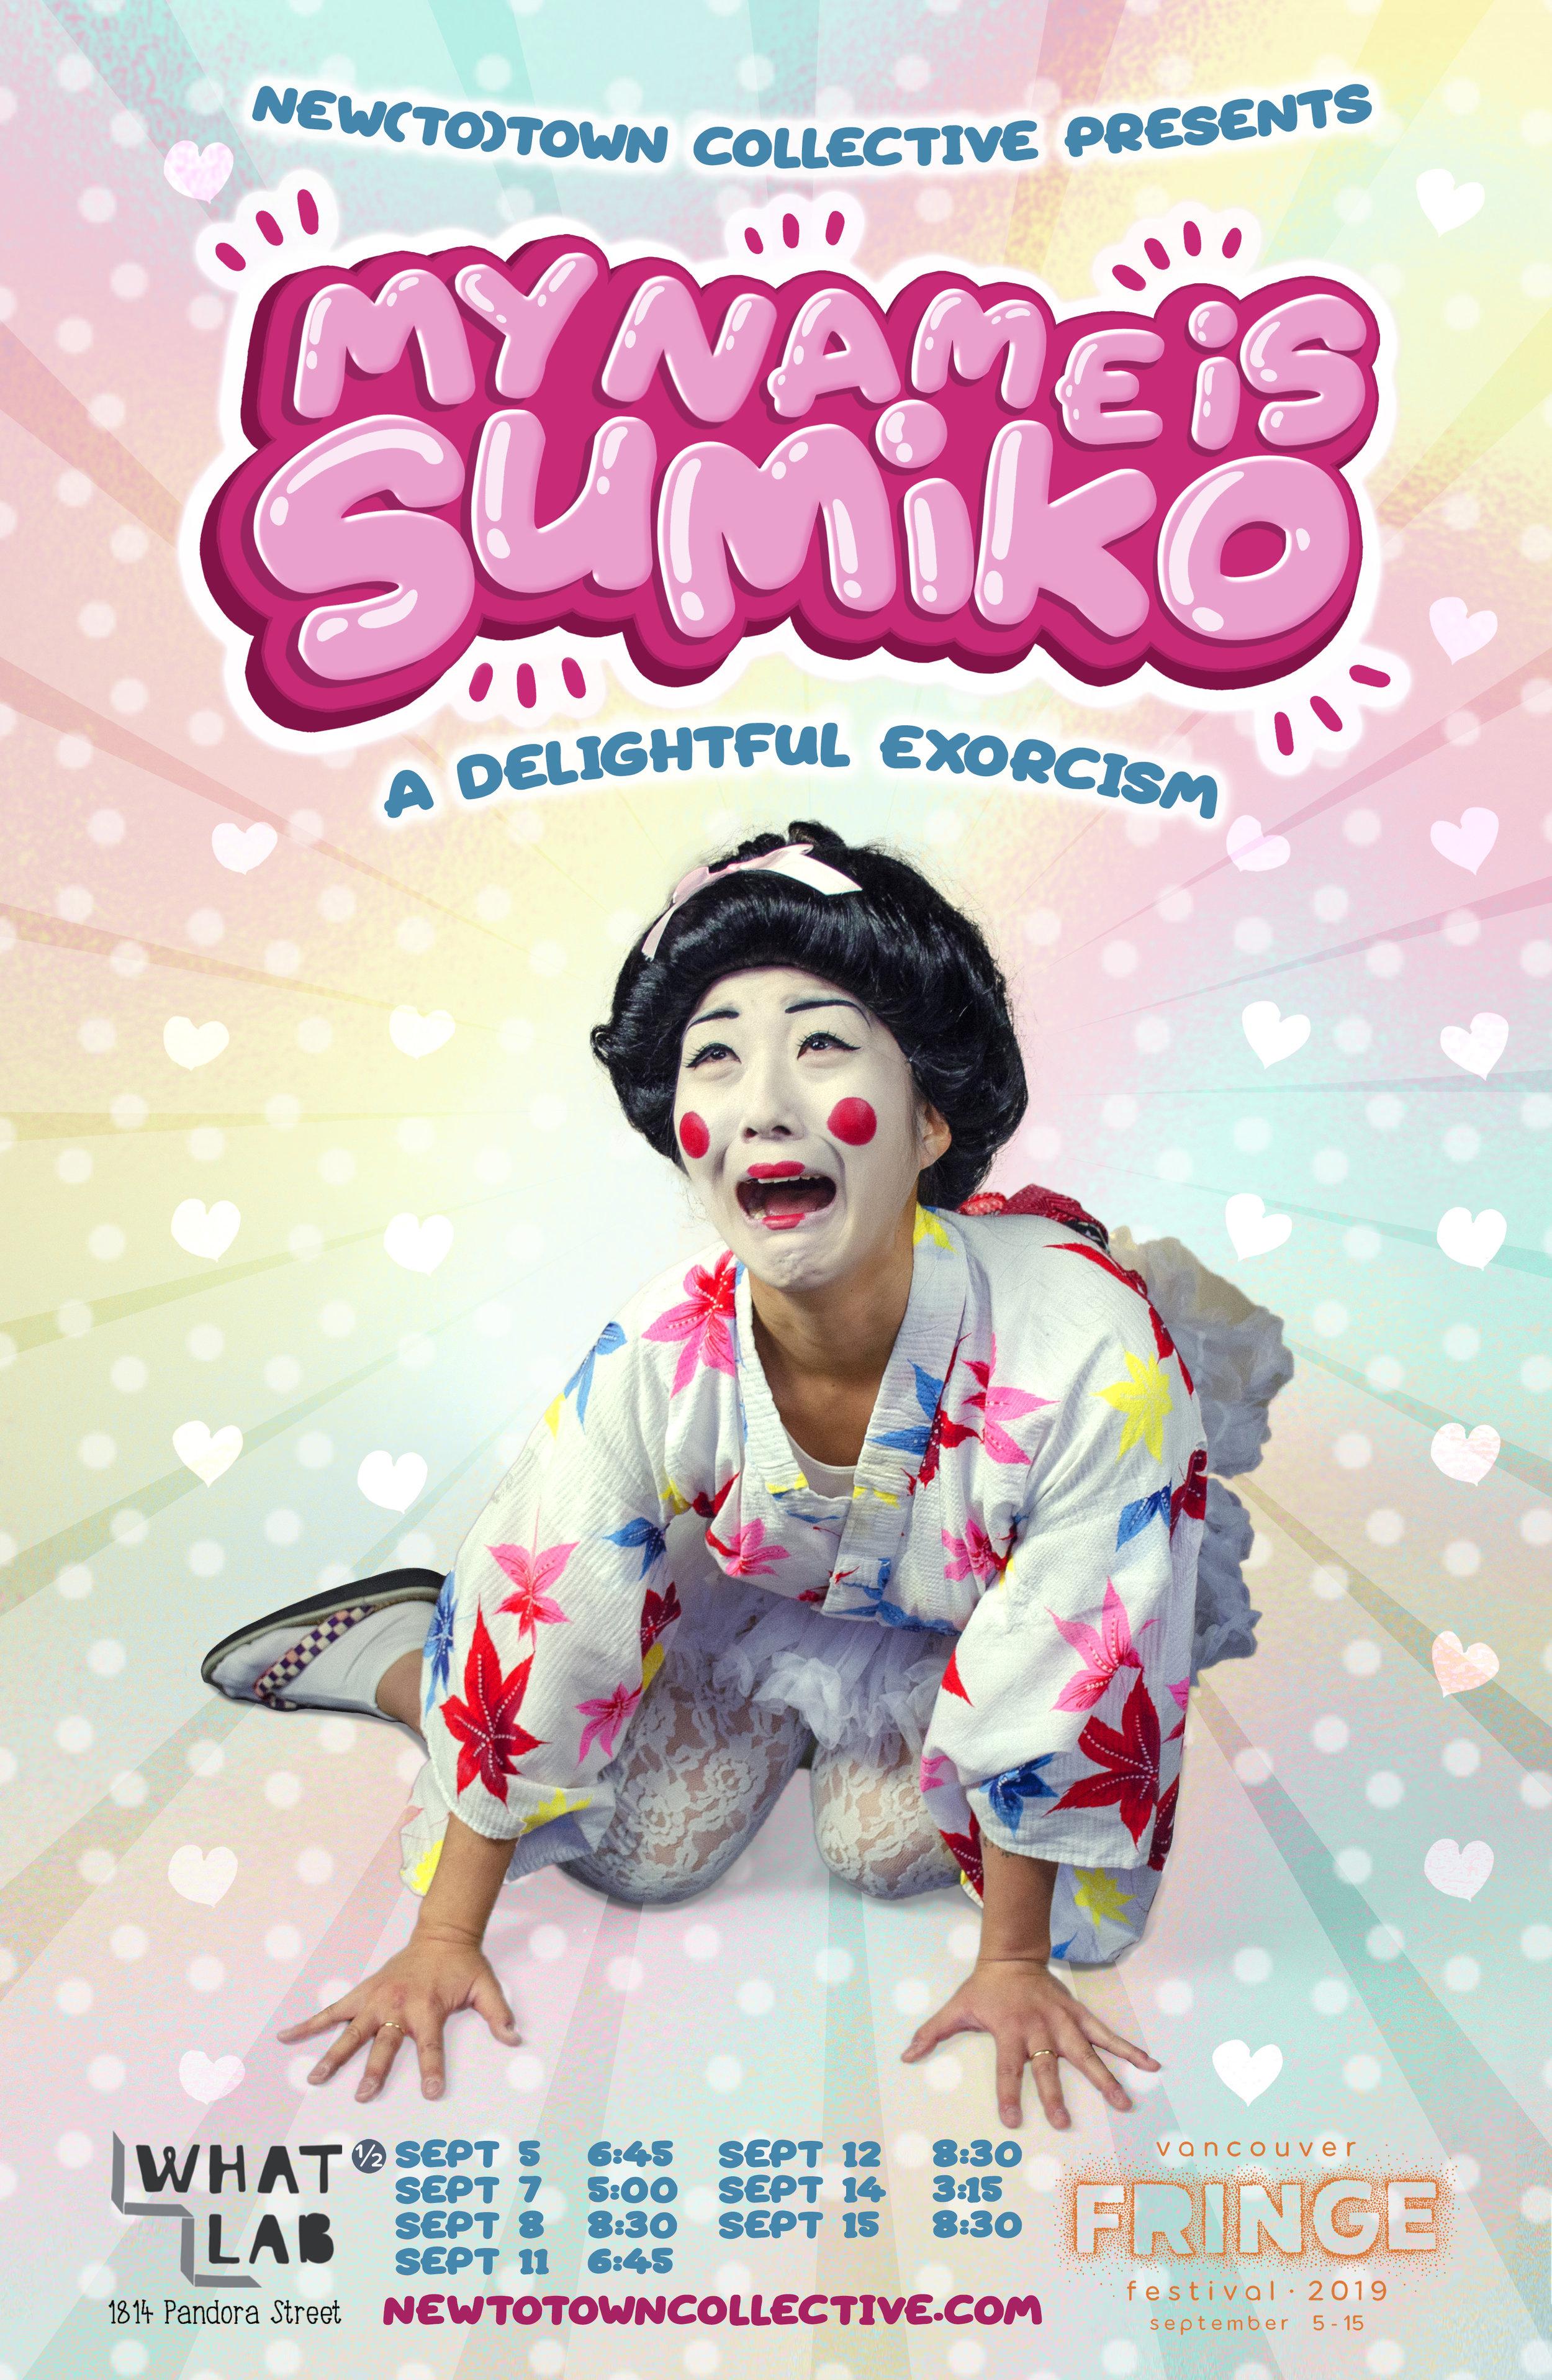 Sumiko-11x17 poster-VanFringe.jpg